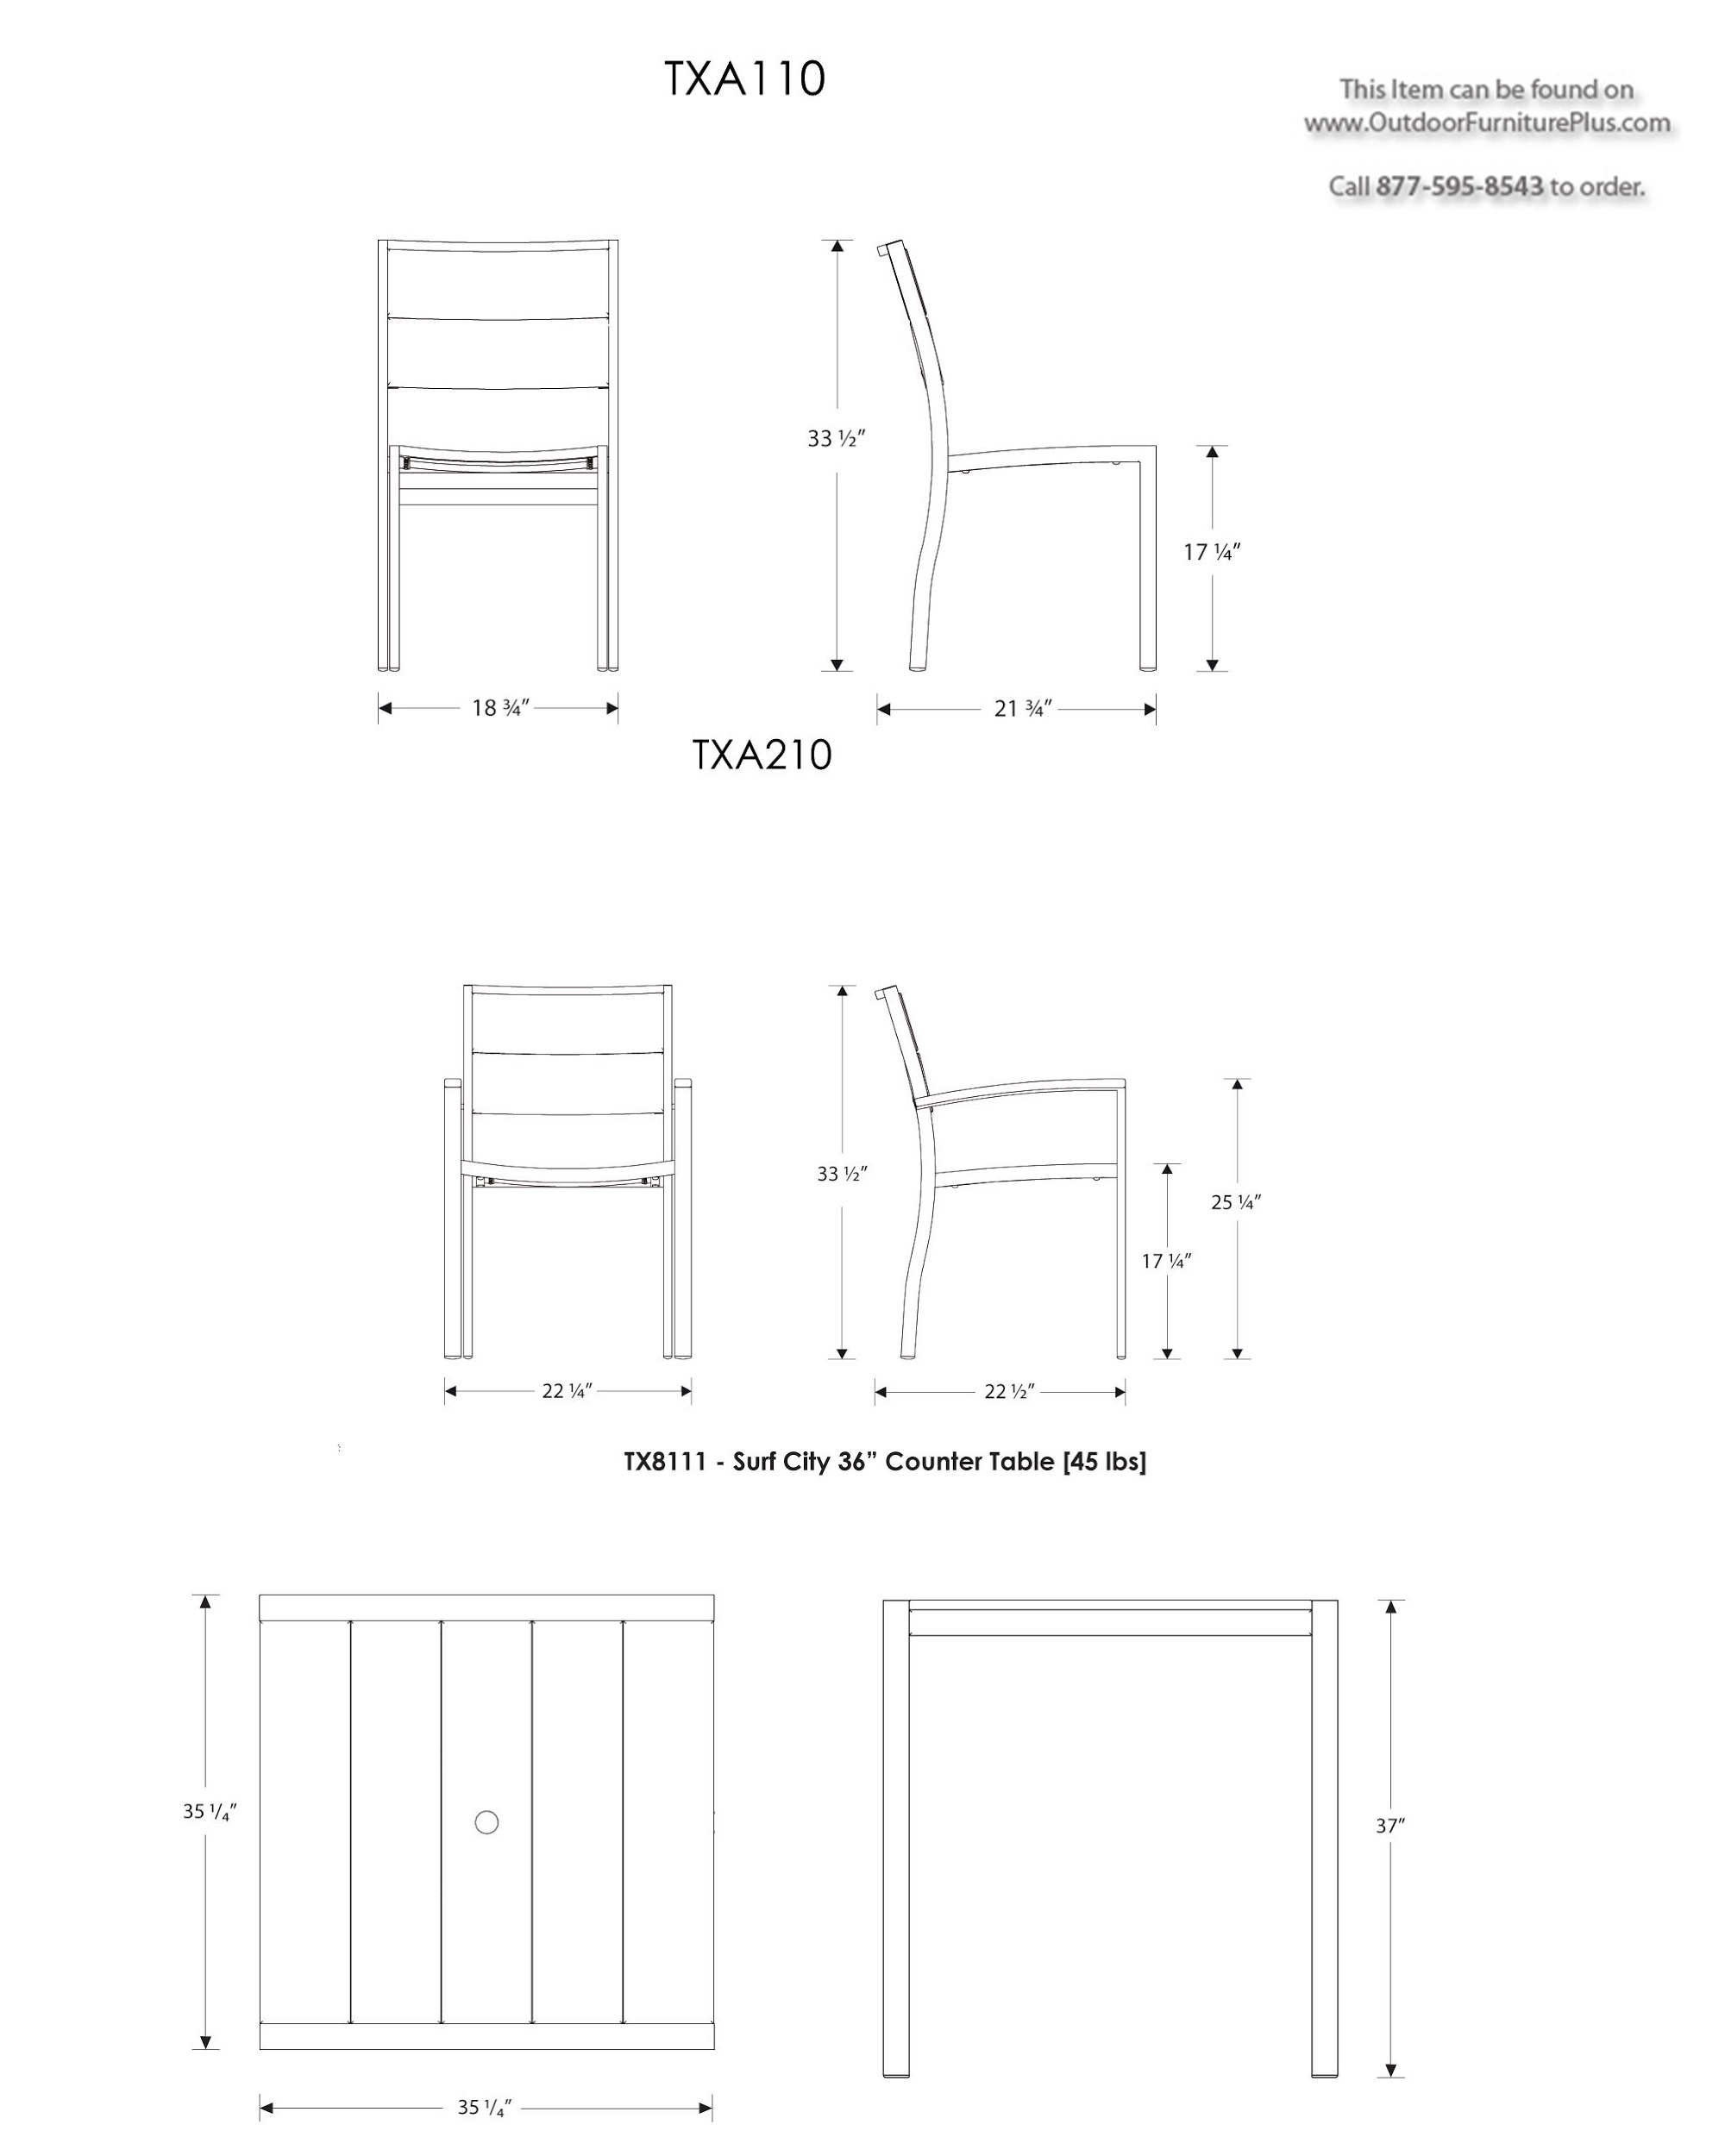 Trex Surf City Dining Set 36 X 36 4 Chairs